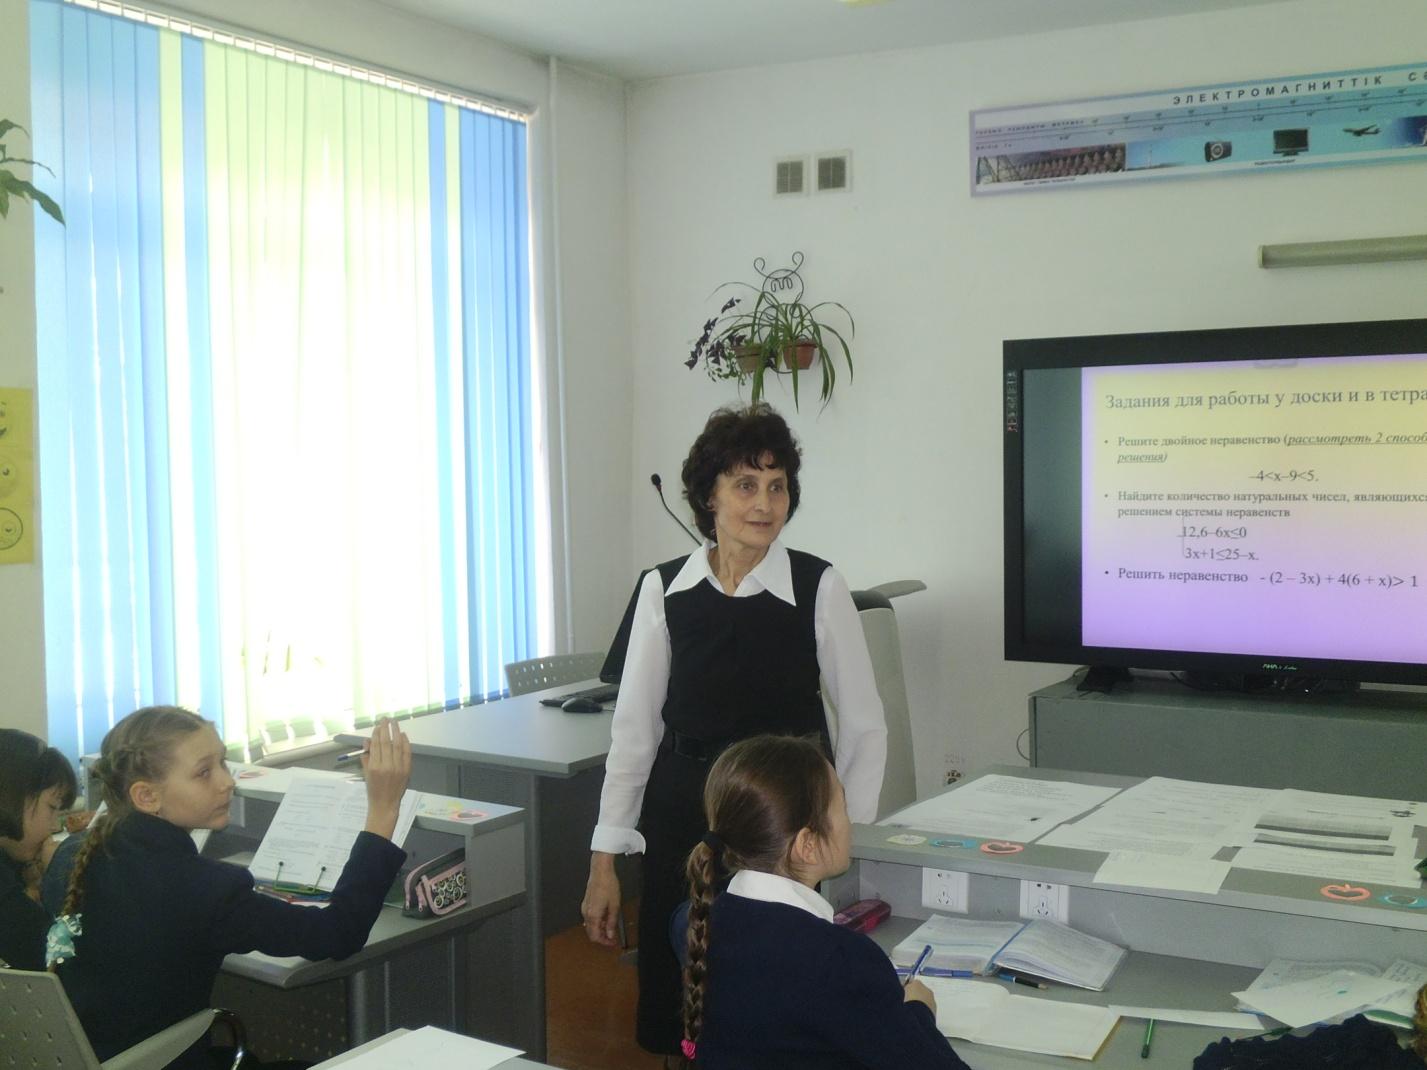 C:\Documents and Settings\Ден\Рабочий стол\P1020336.JPG